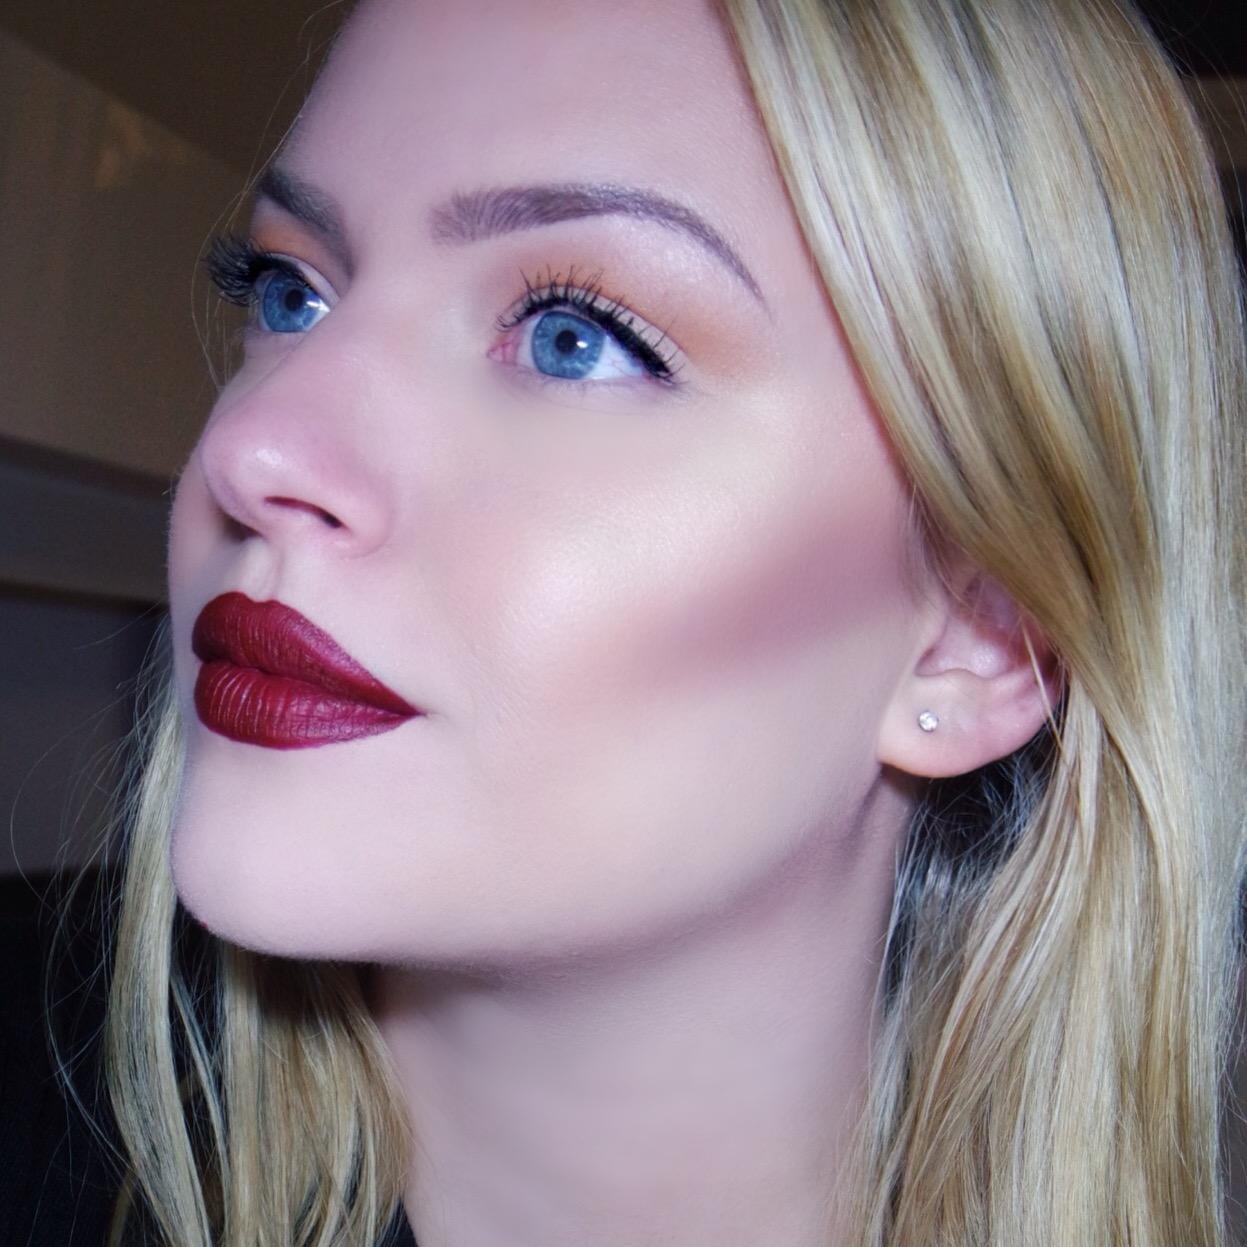 Makeup by Myrna - Beauty Blog: Ofra Cosmetics Long Lasting Liquid Lipstick in Havana Nights by ...